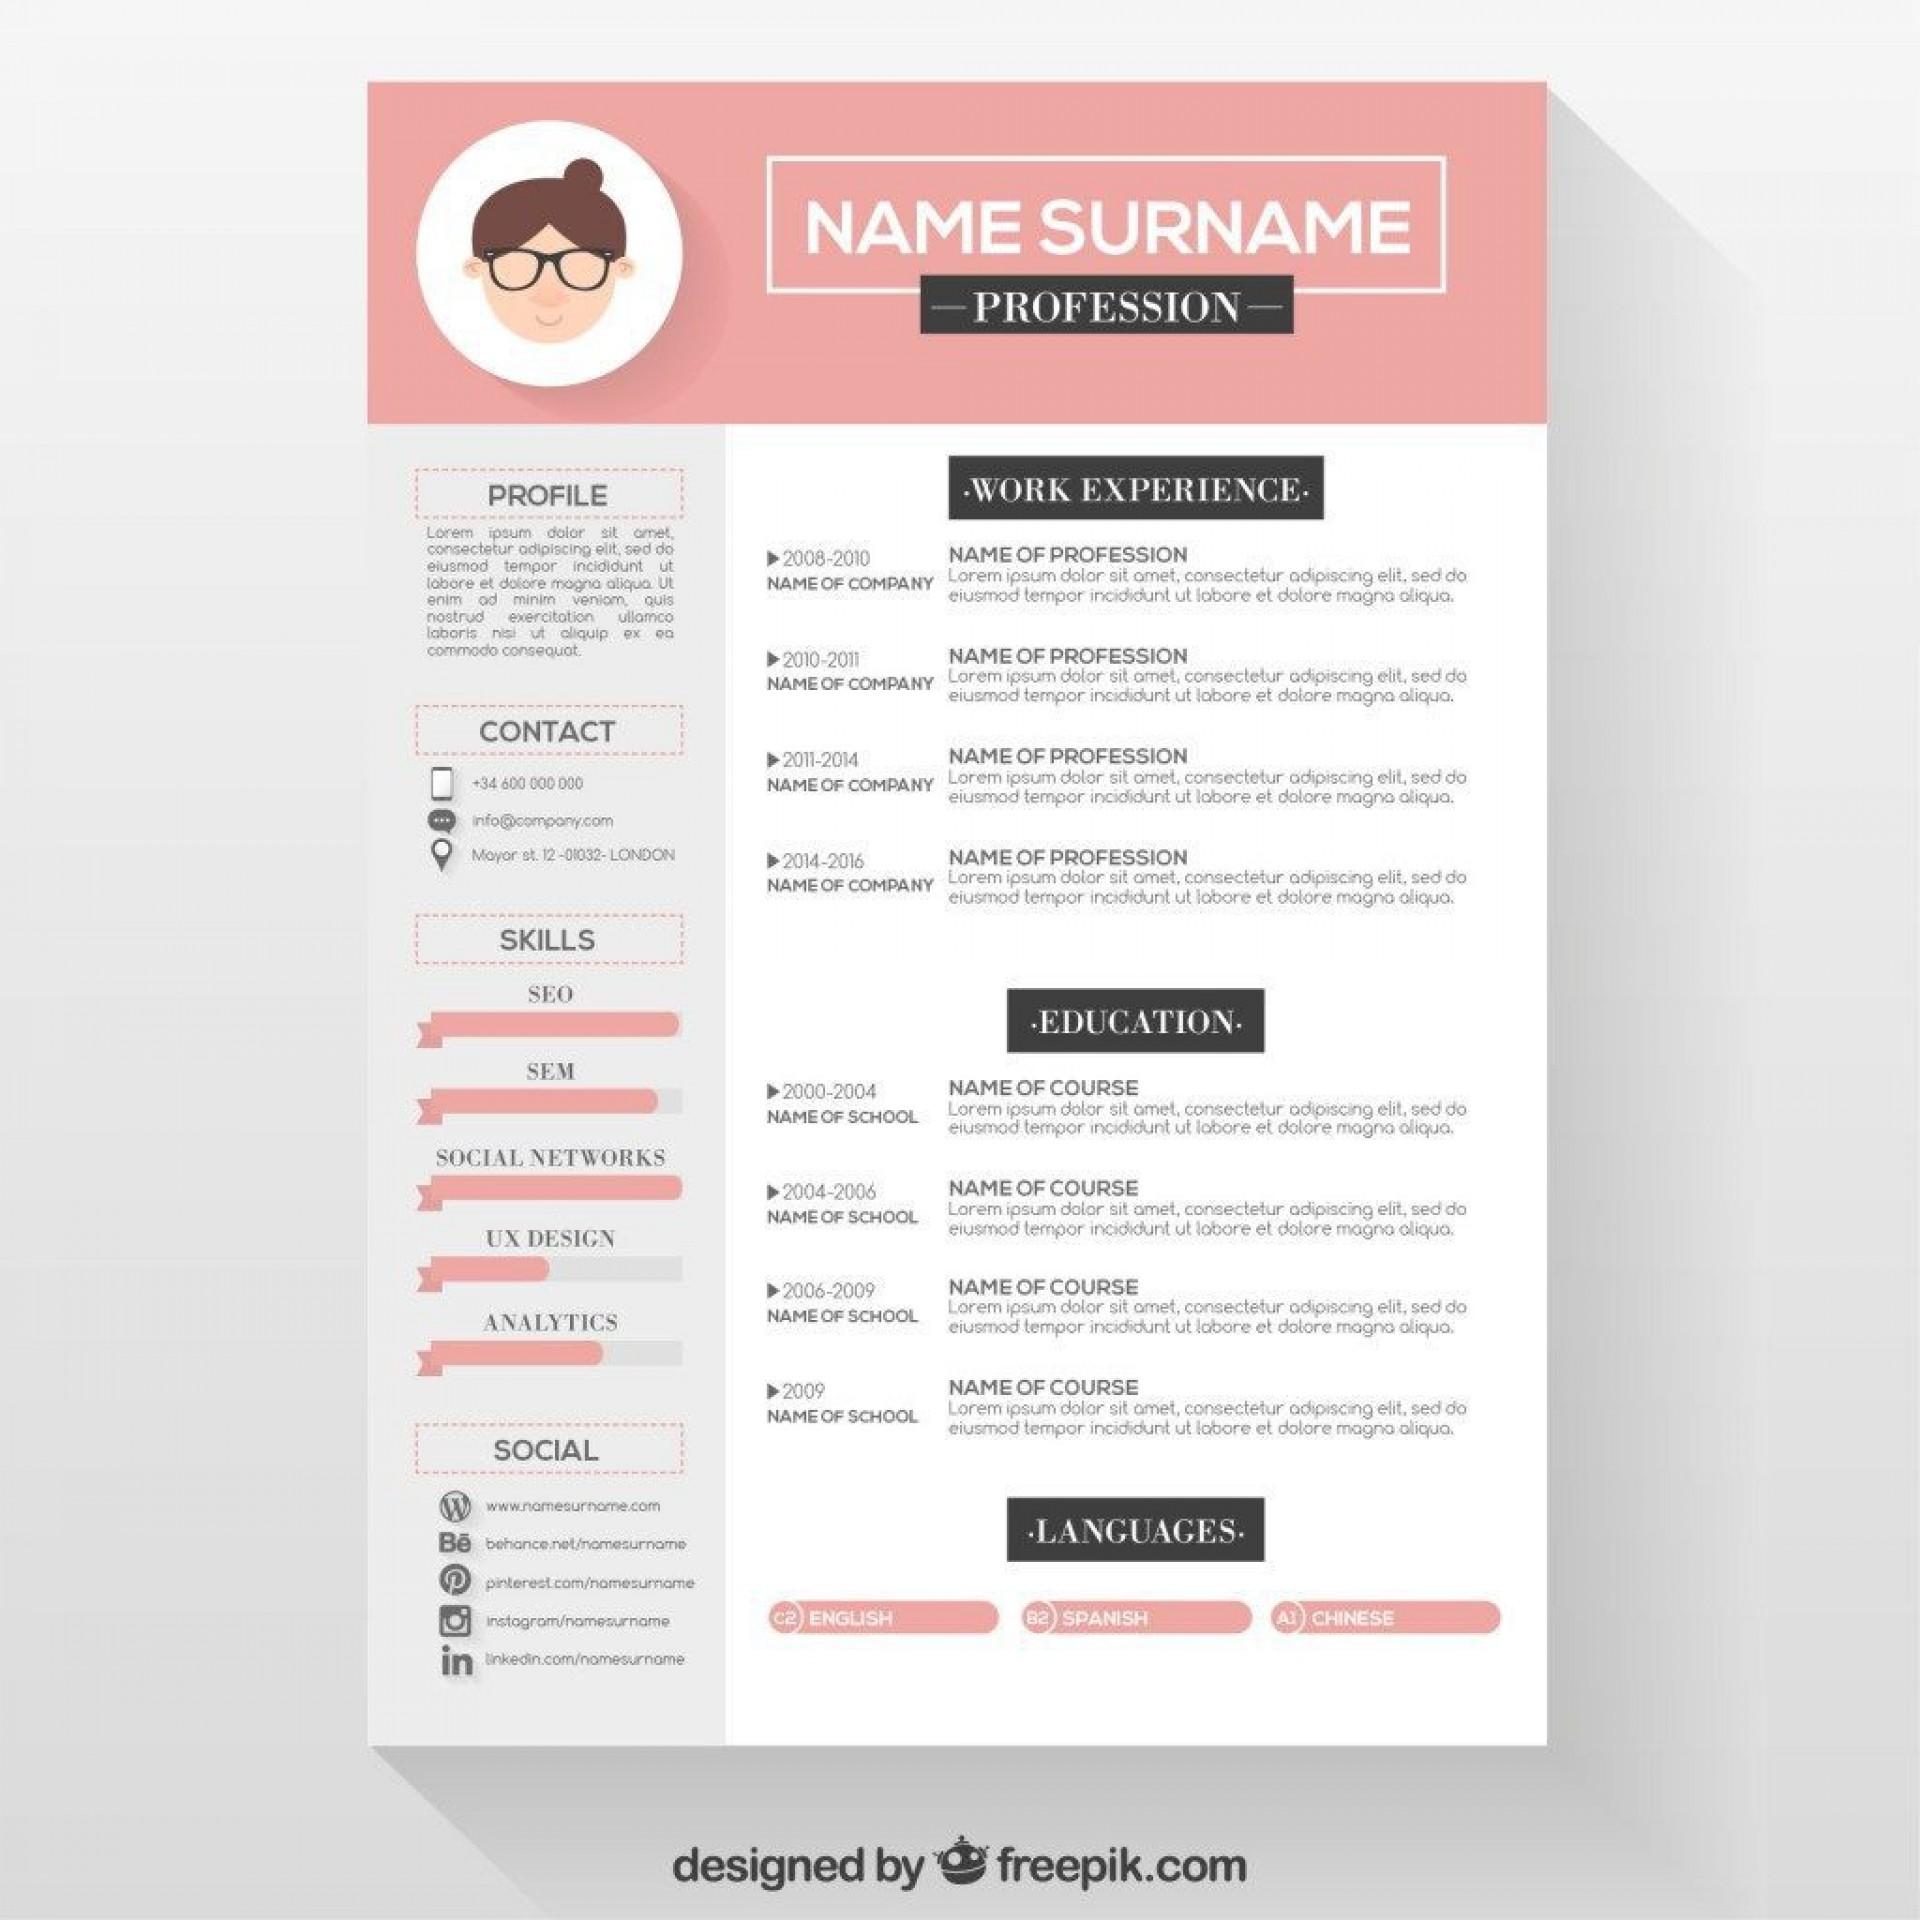 007 Fearsome Download Resume Sample Free Image  Teacher Cv Graphic Designer Word Format Nurse Template1920